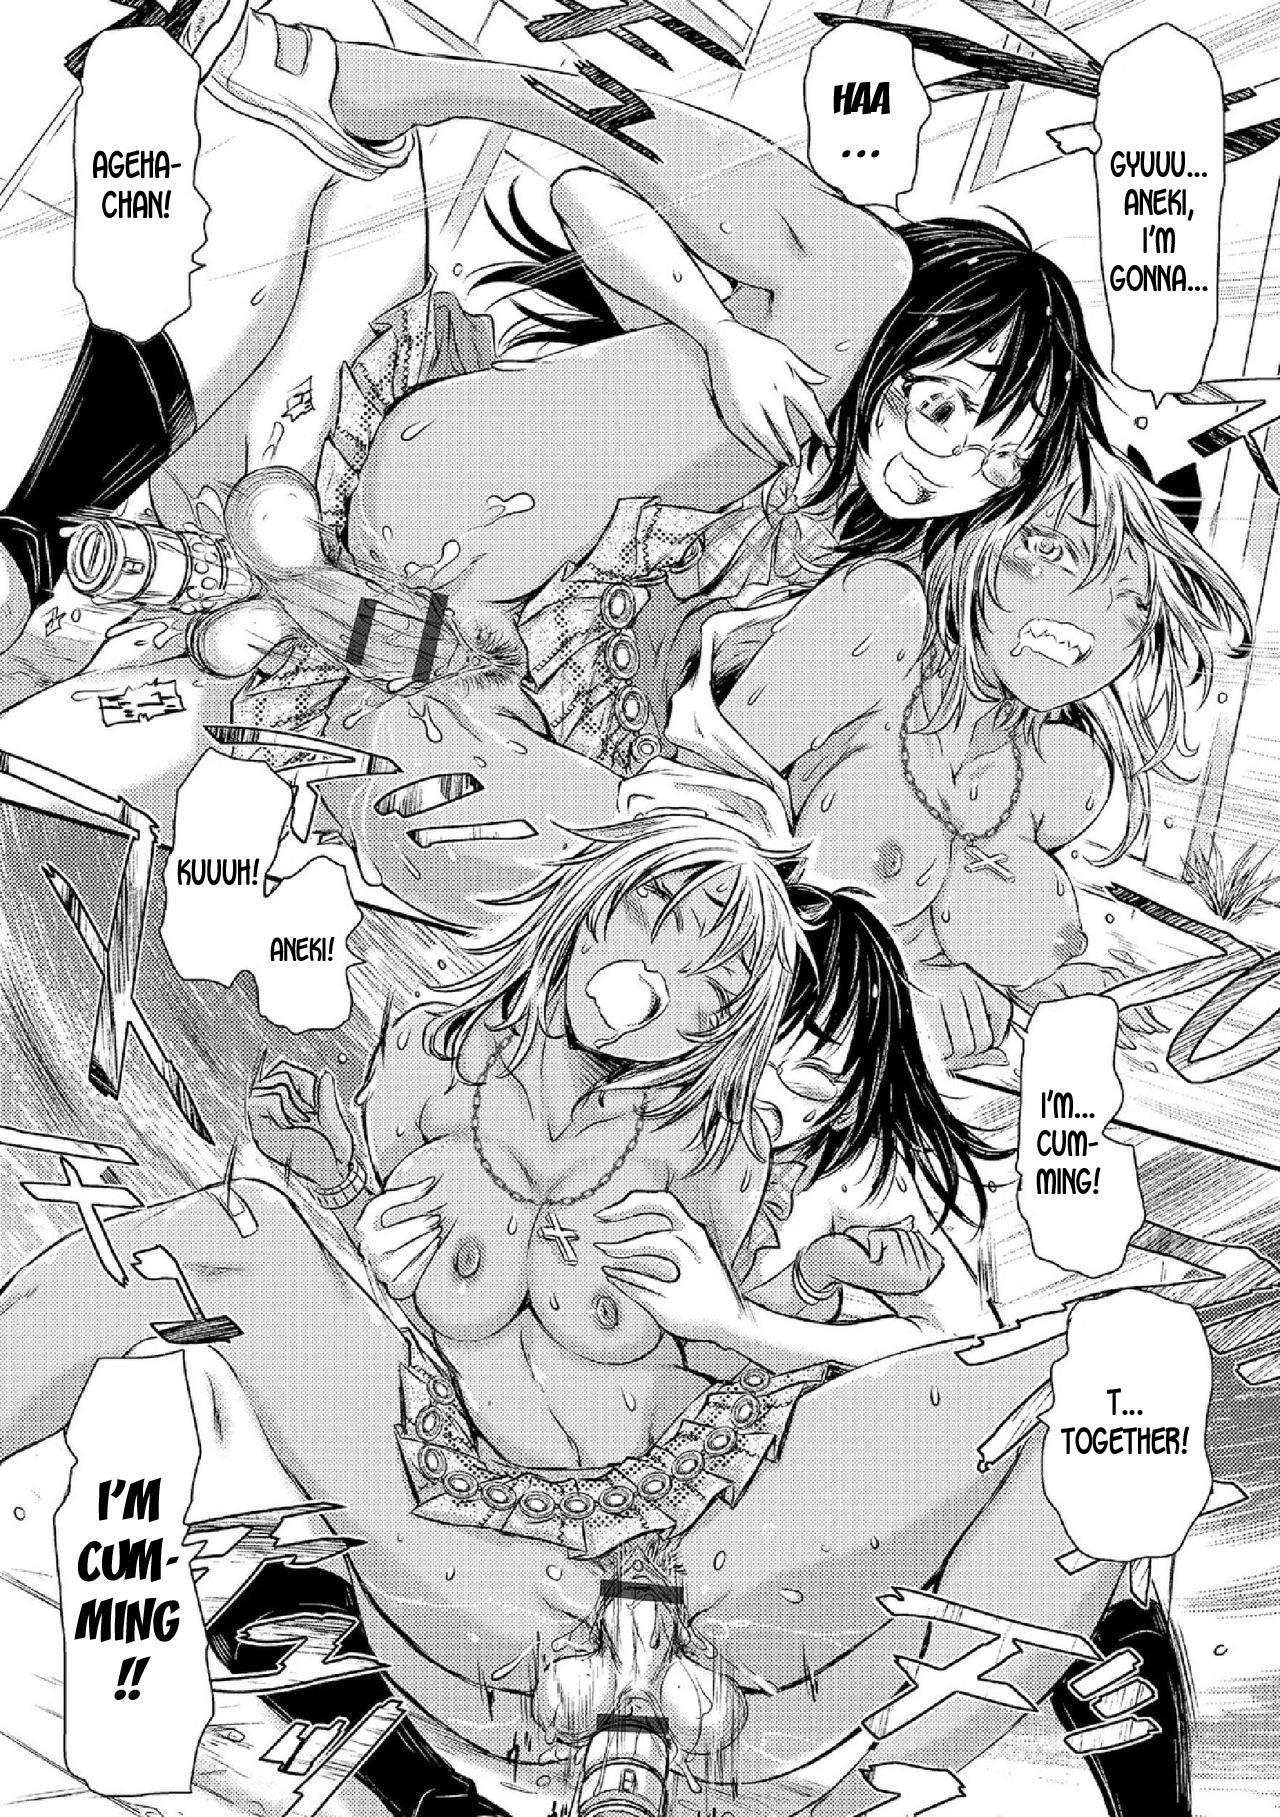 [Ishino Kanon] Onee-chan ga Onii-chan | Onee-chan is Onii-chan (Futanari Secrosse!!) [English] [desudesu] 13